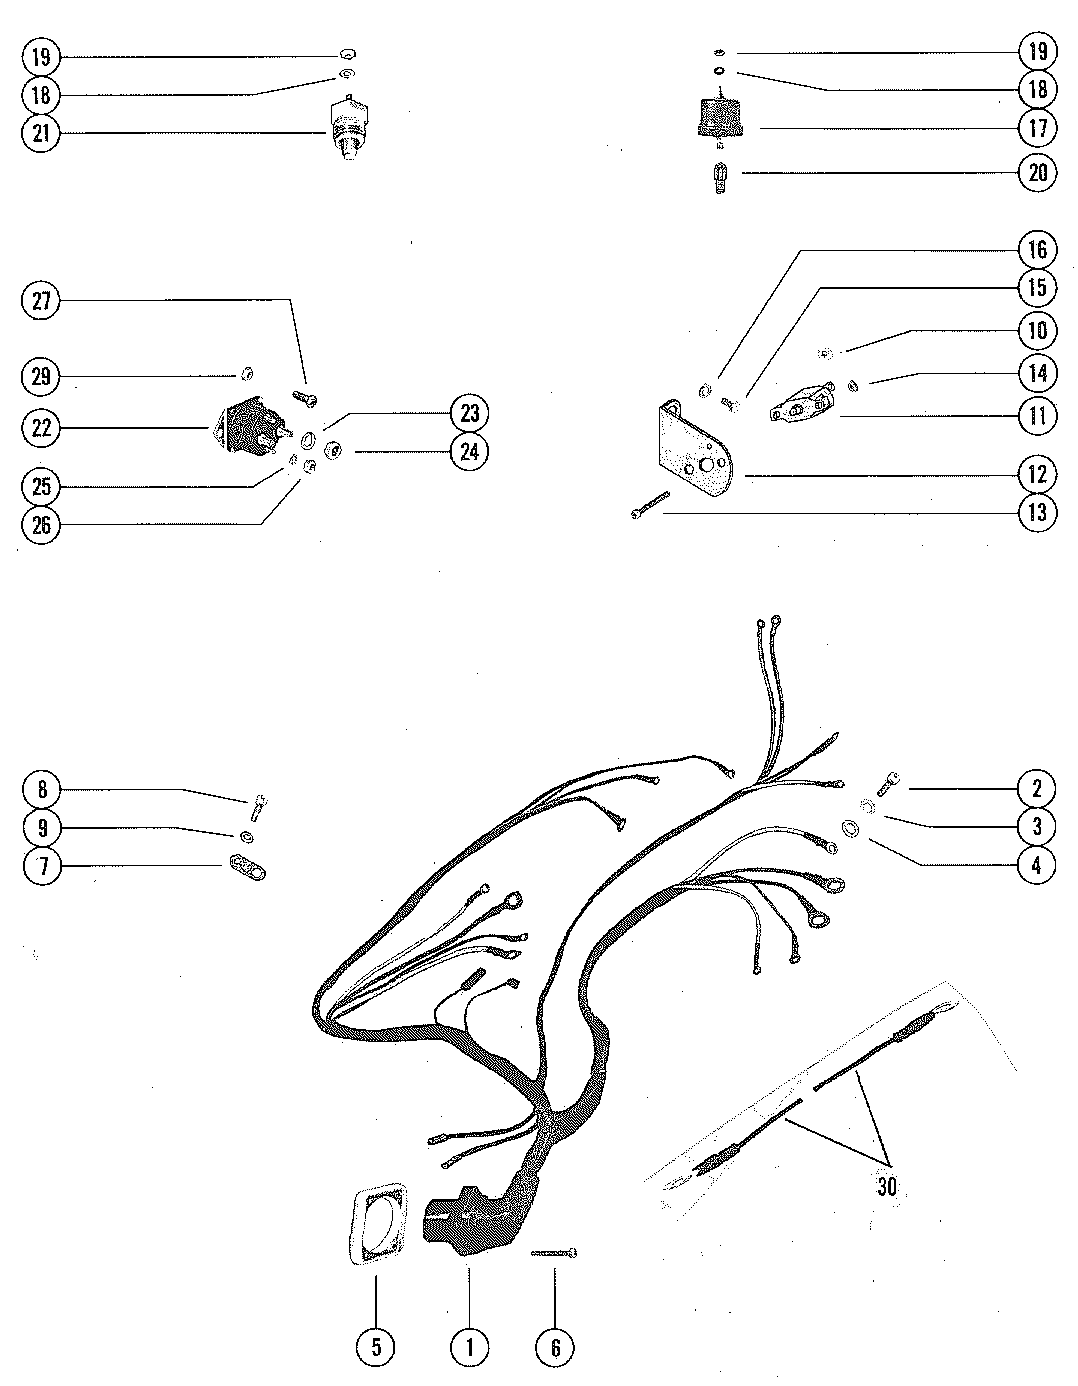 Mercruiser Trim Gauge Wiring Diagram Schematic 2019 Tilt Indicator Mercury And